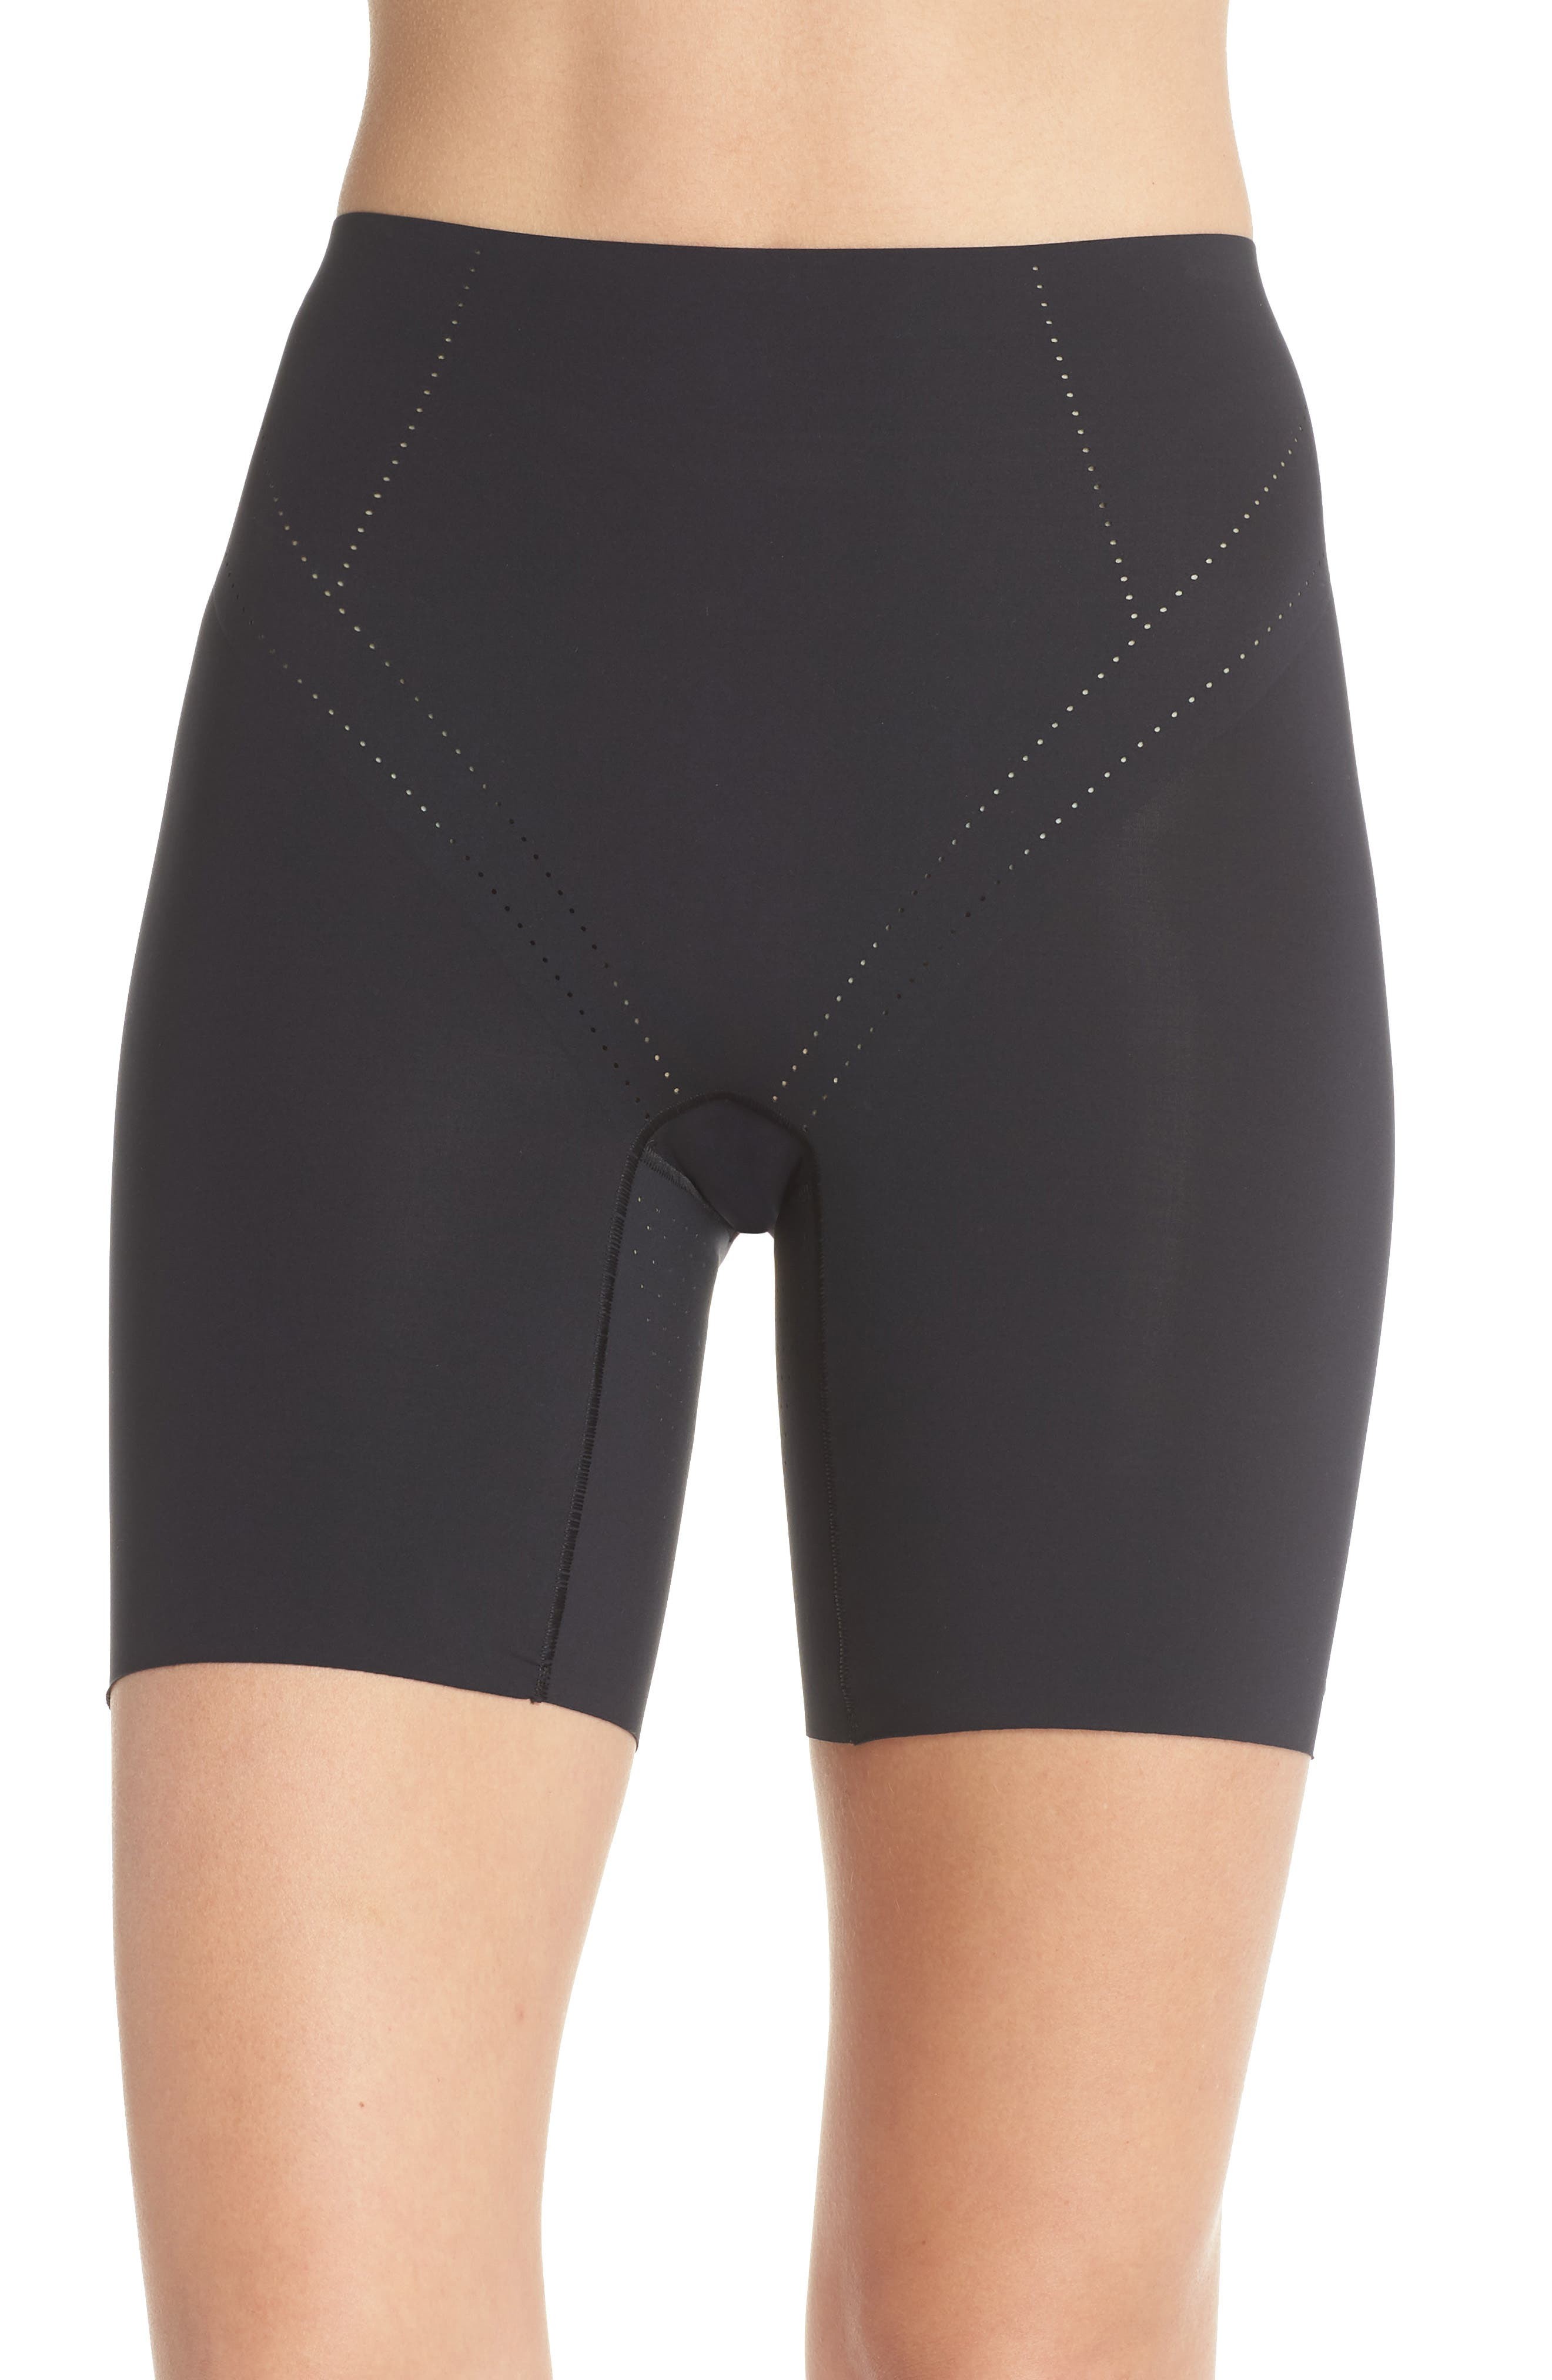 Shape Air Shaper Shorts,                         Main,                         color, Black